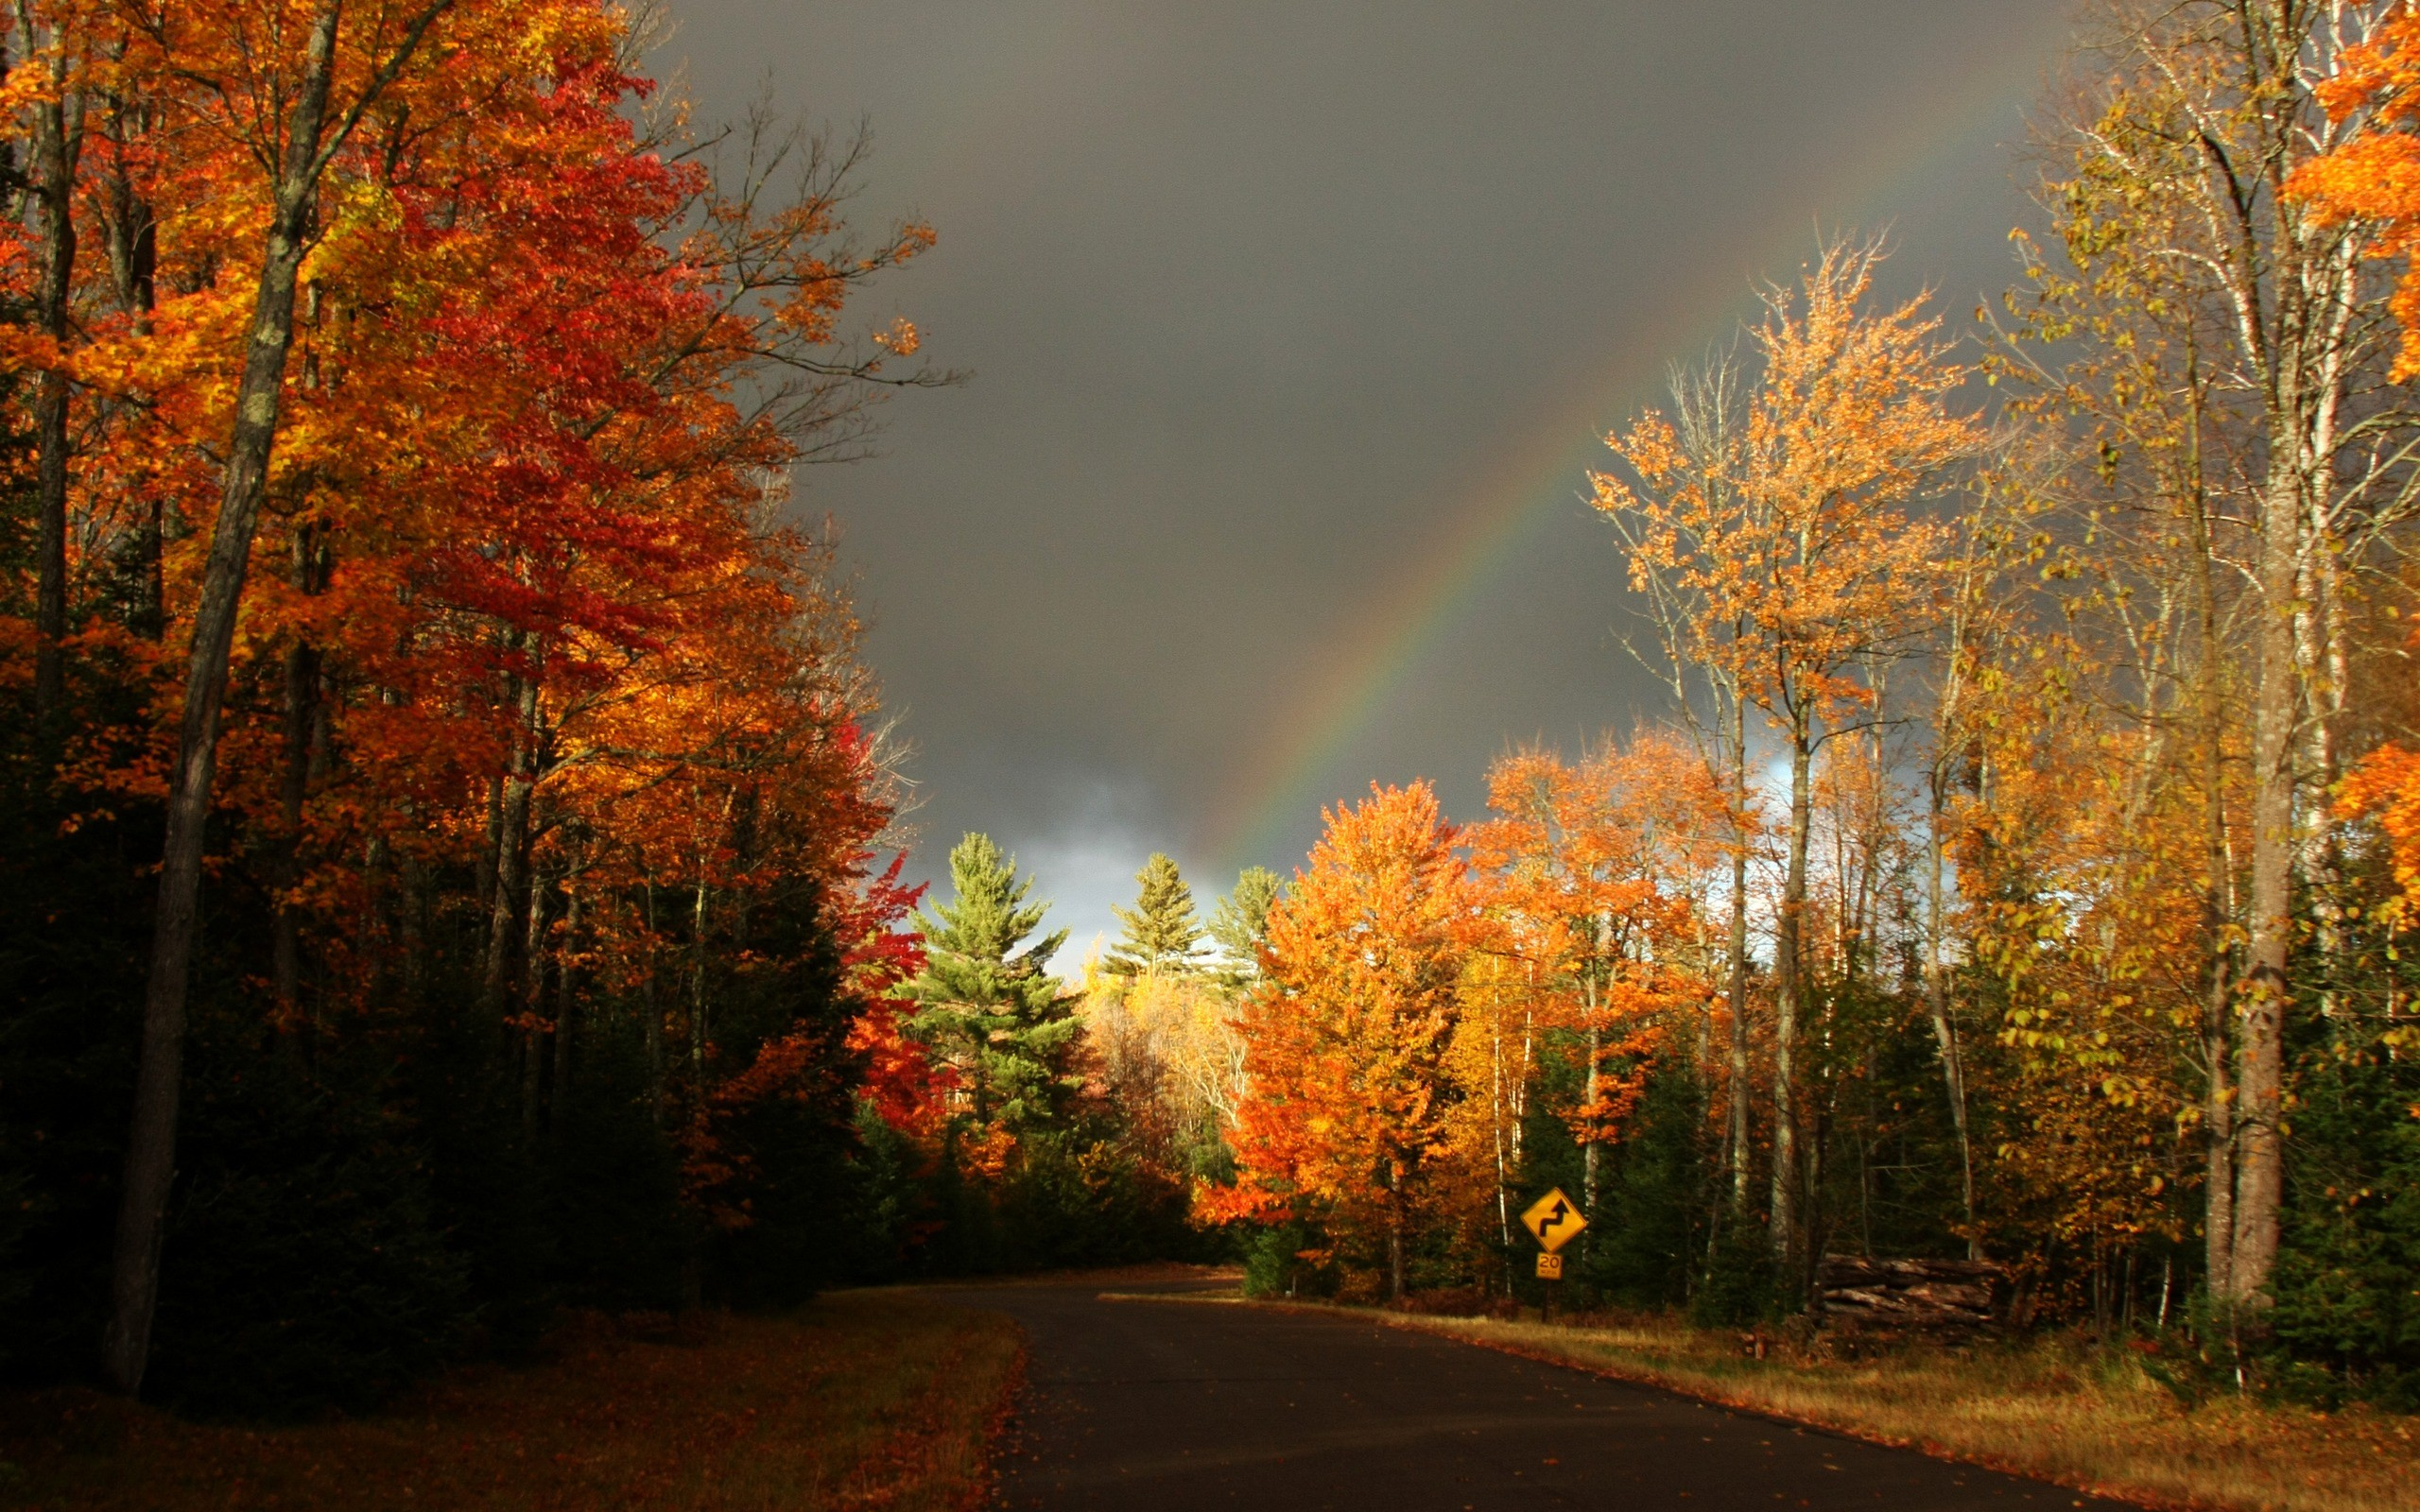 Gorgeous-Autumn-Road-Wallpaper.jpg 2,560×1,600 pixels | Autumn Fun |  Pinterest | Autumn and Wallpaper